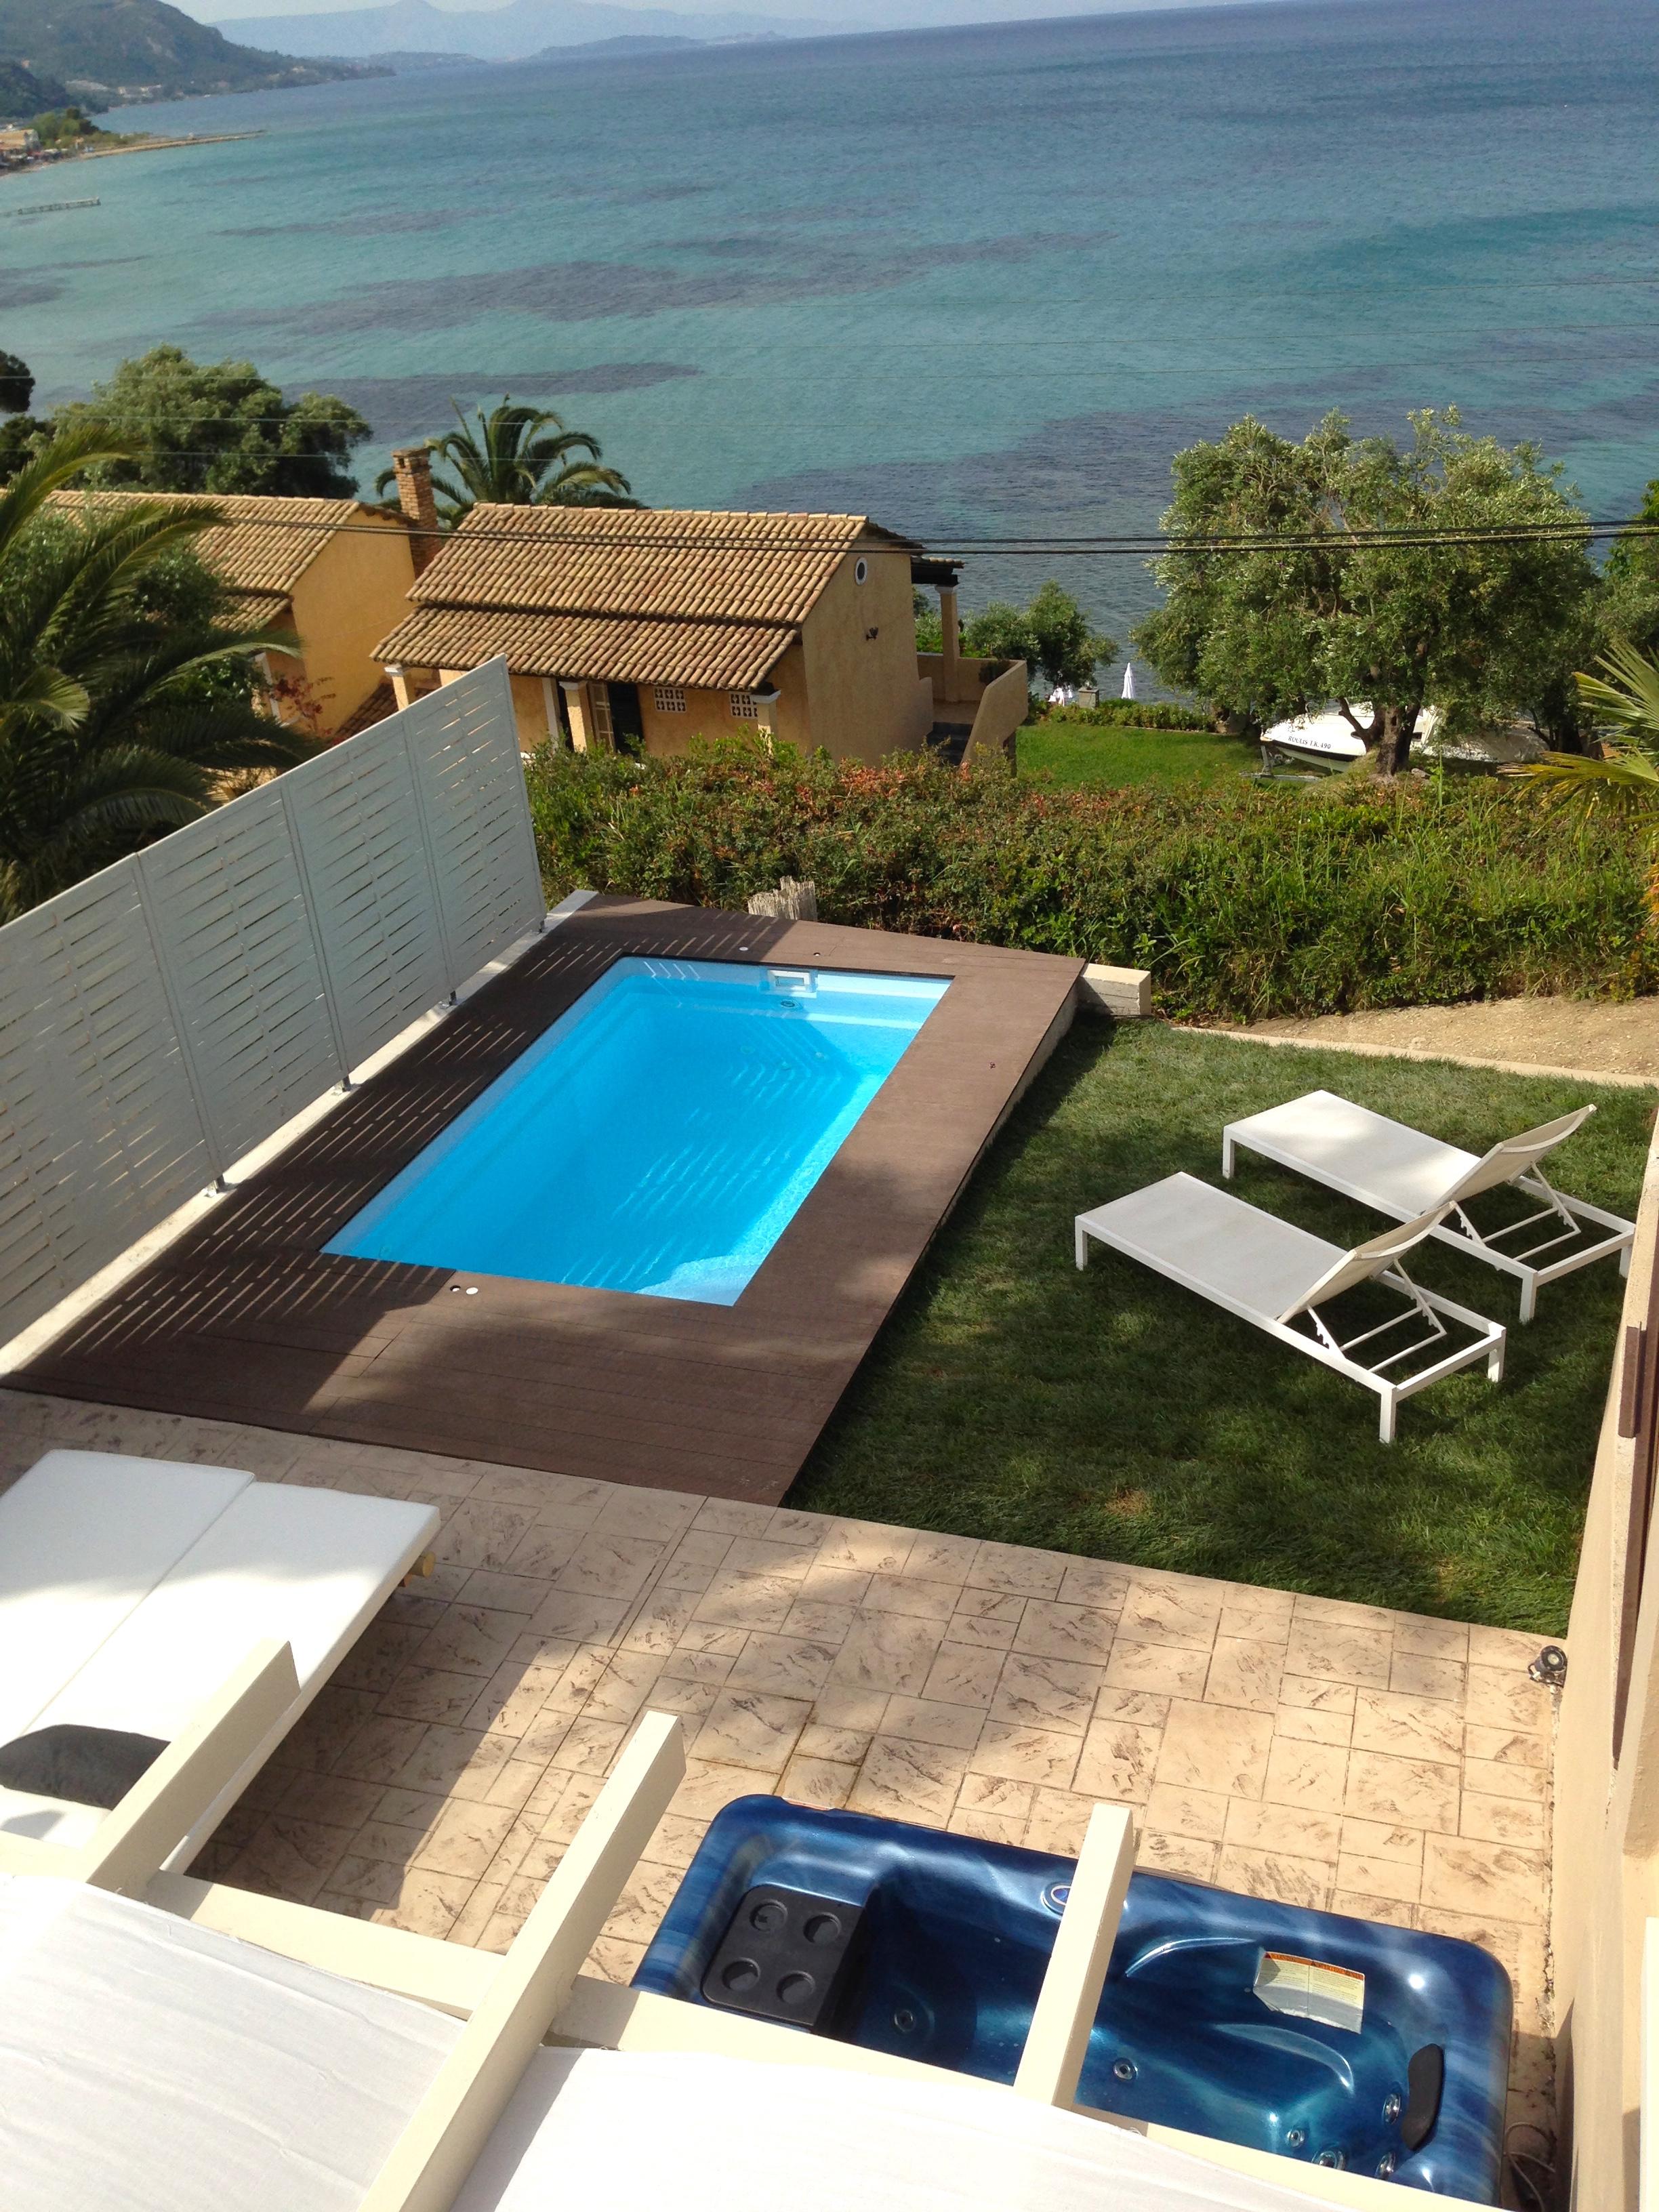 Big Spa - Ypsilon (Prefabricated swimming pool & Spa)